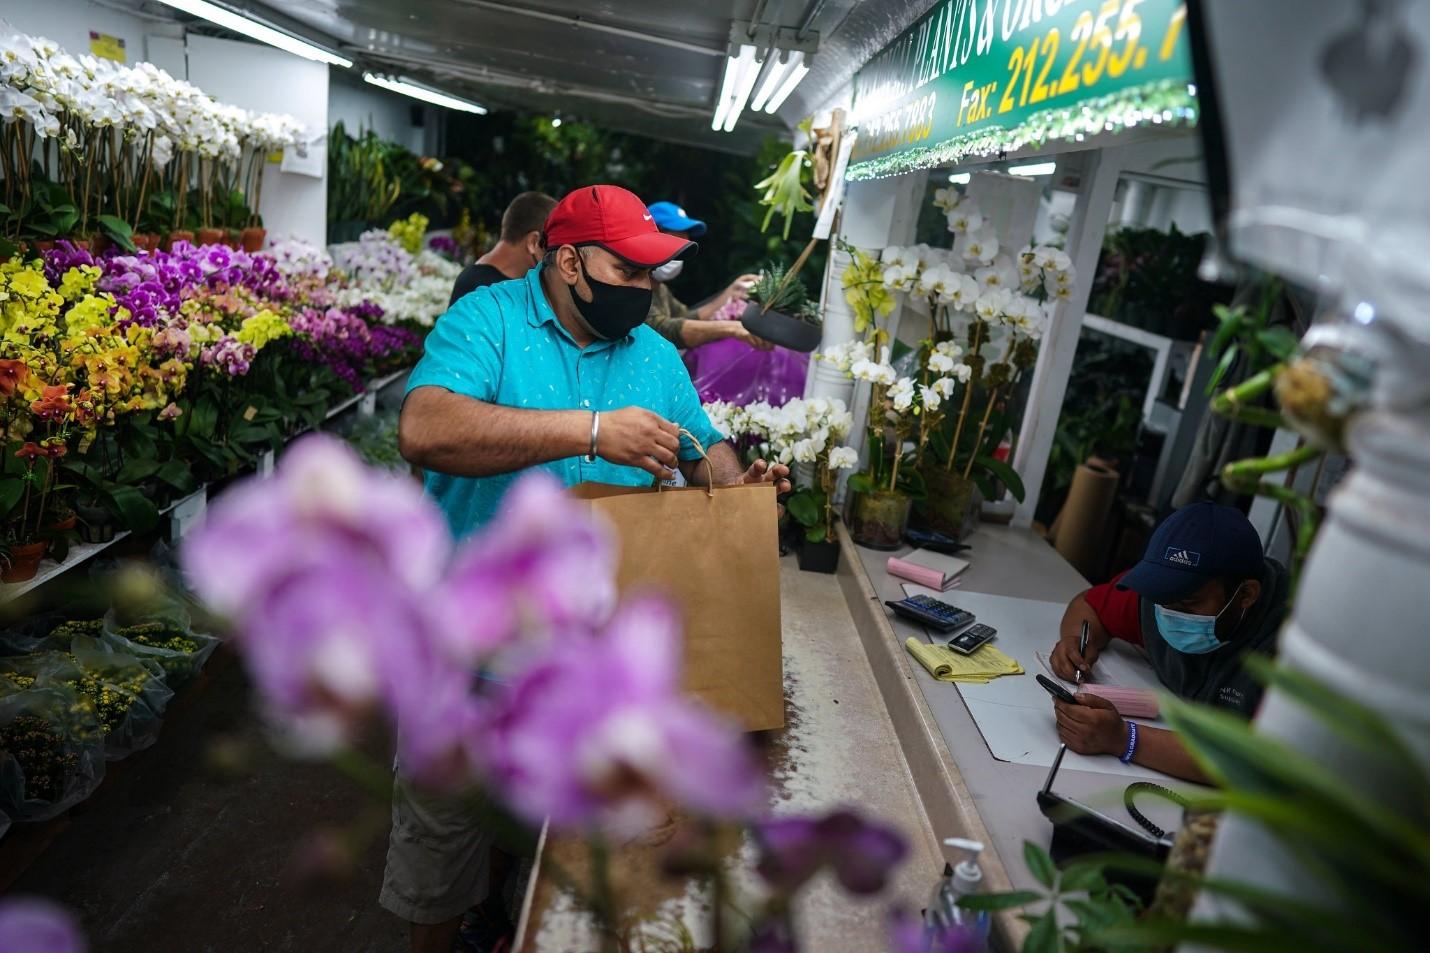 Ashok Kumar și-a redeschis florăria din Manhattan luni dimineață. Sursă foto: Chang W. Lee/The New York Times